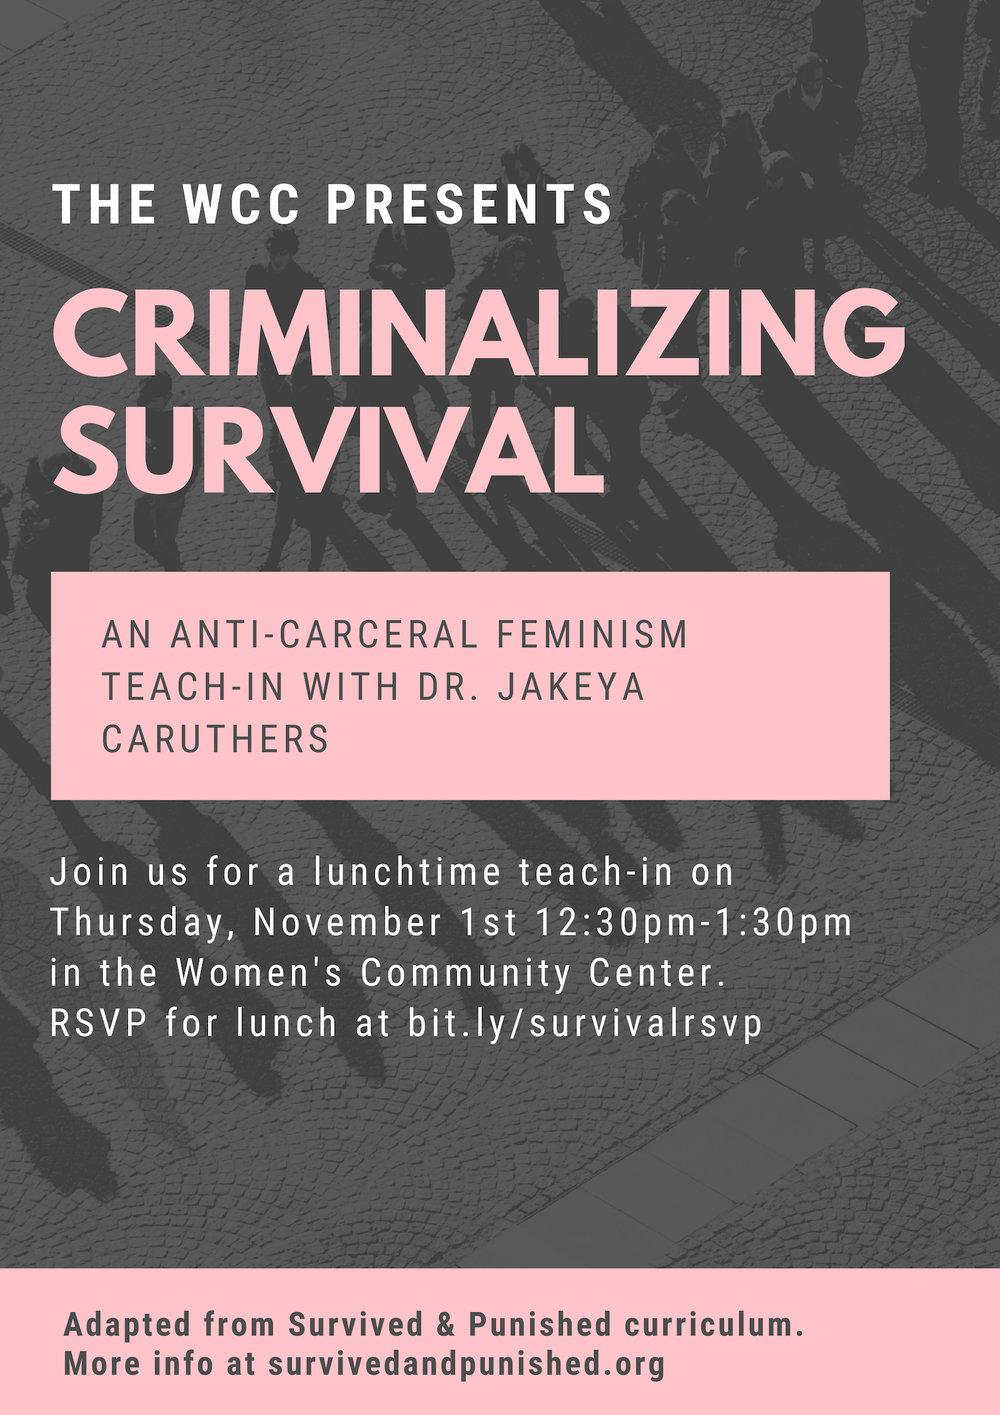 criminalizing survival (2).jpg